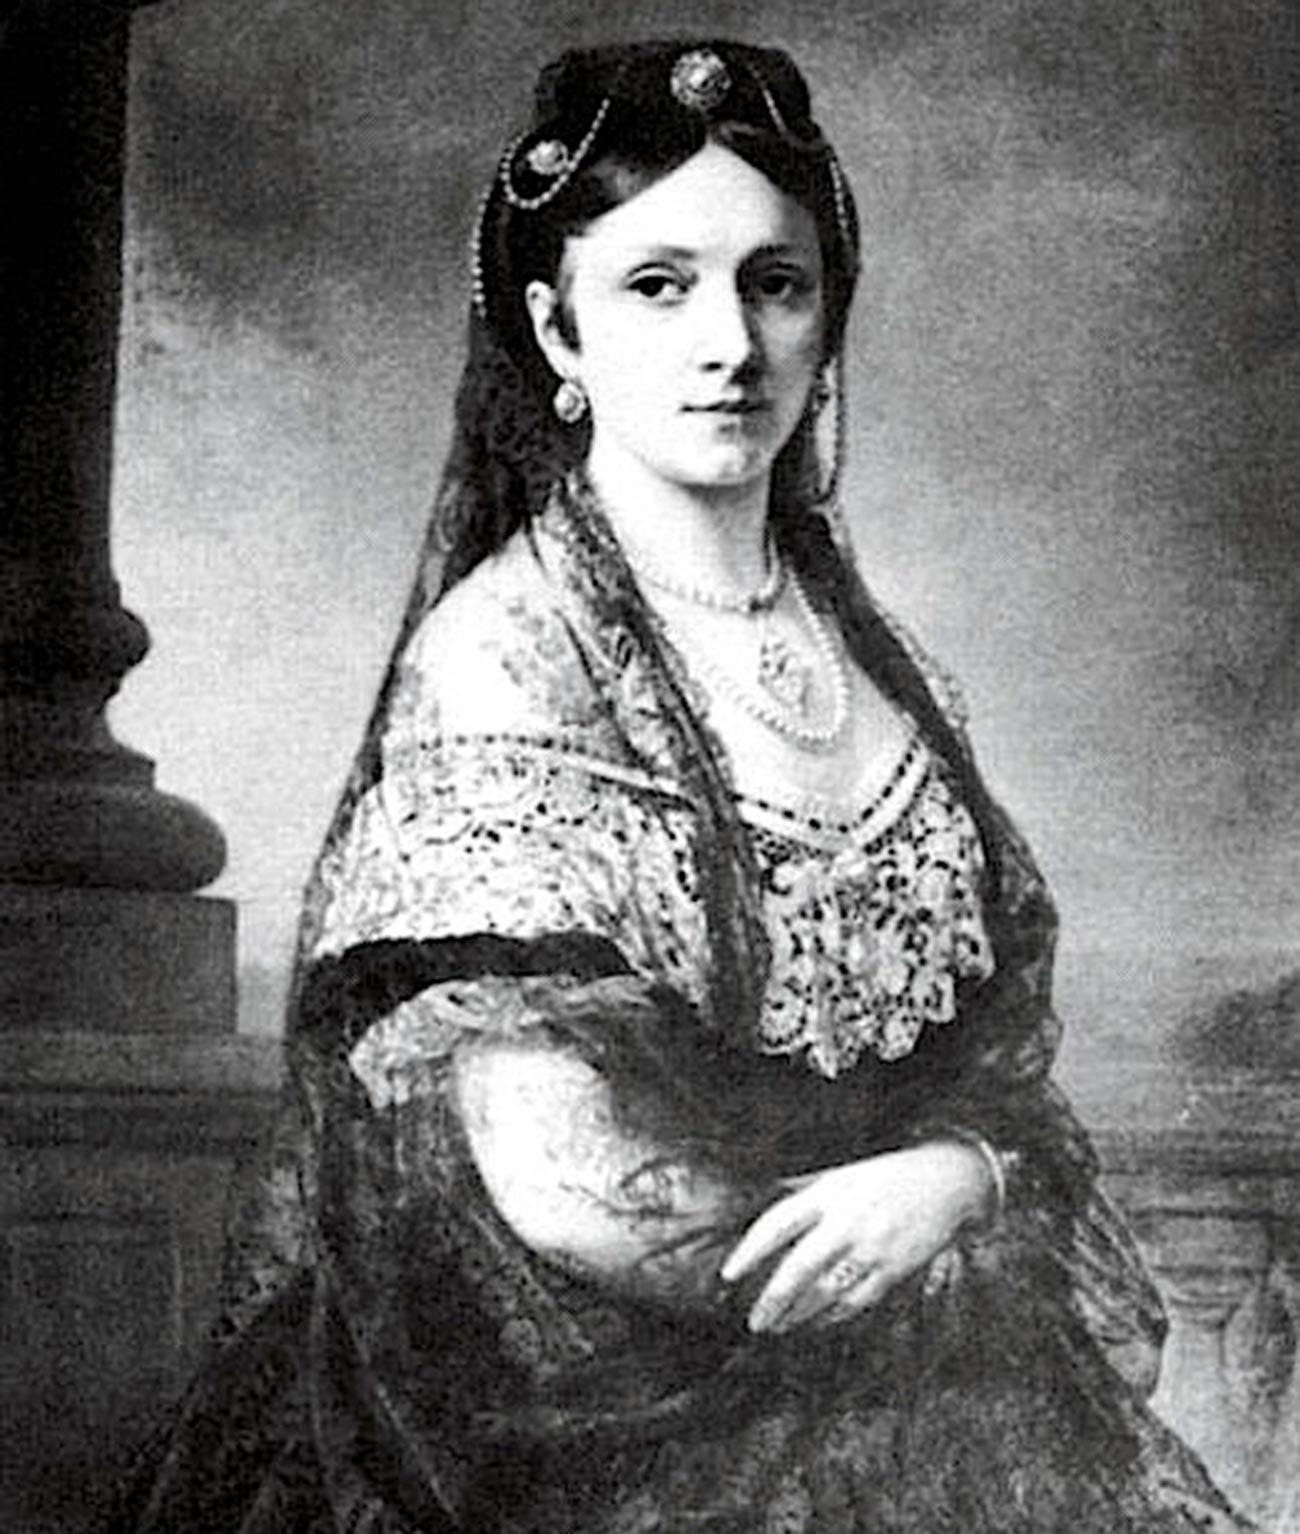 Júlia Hauke, Princesa von Battenberg